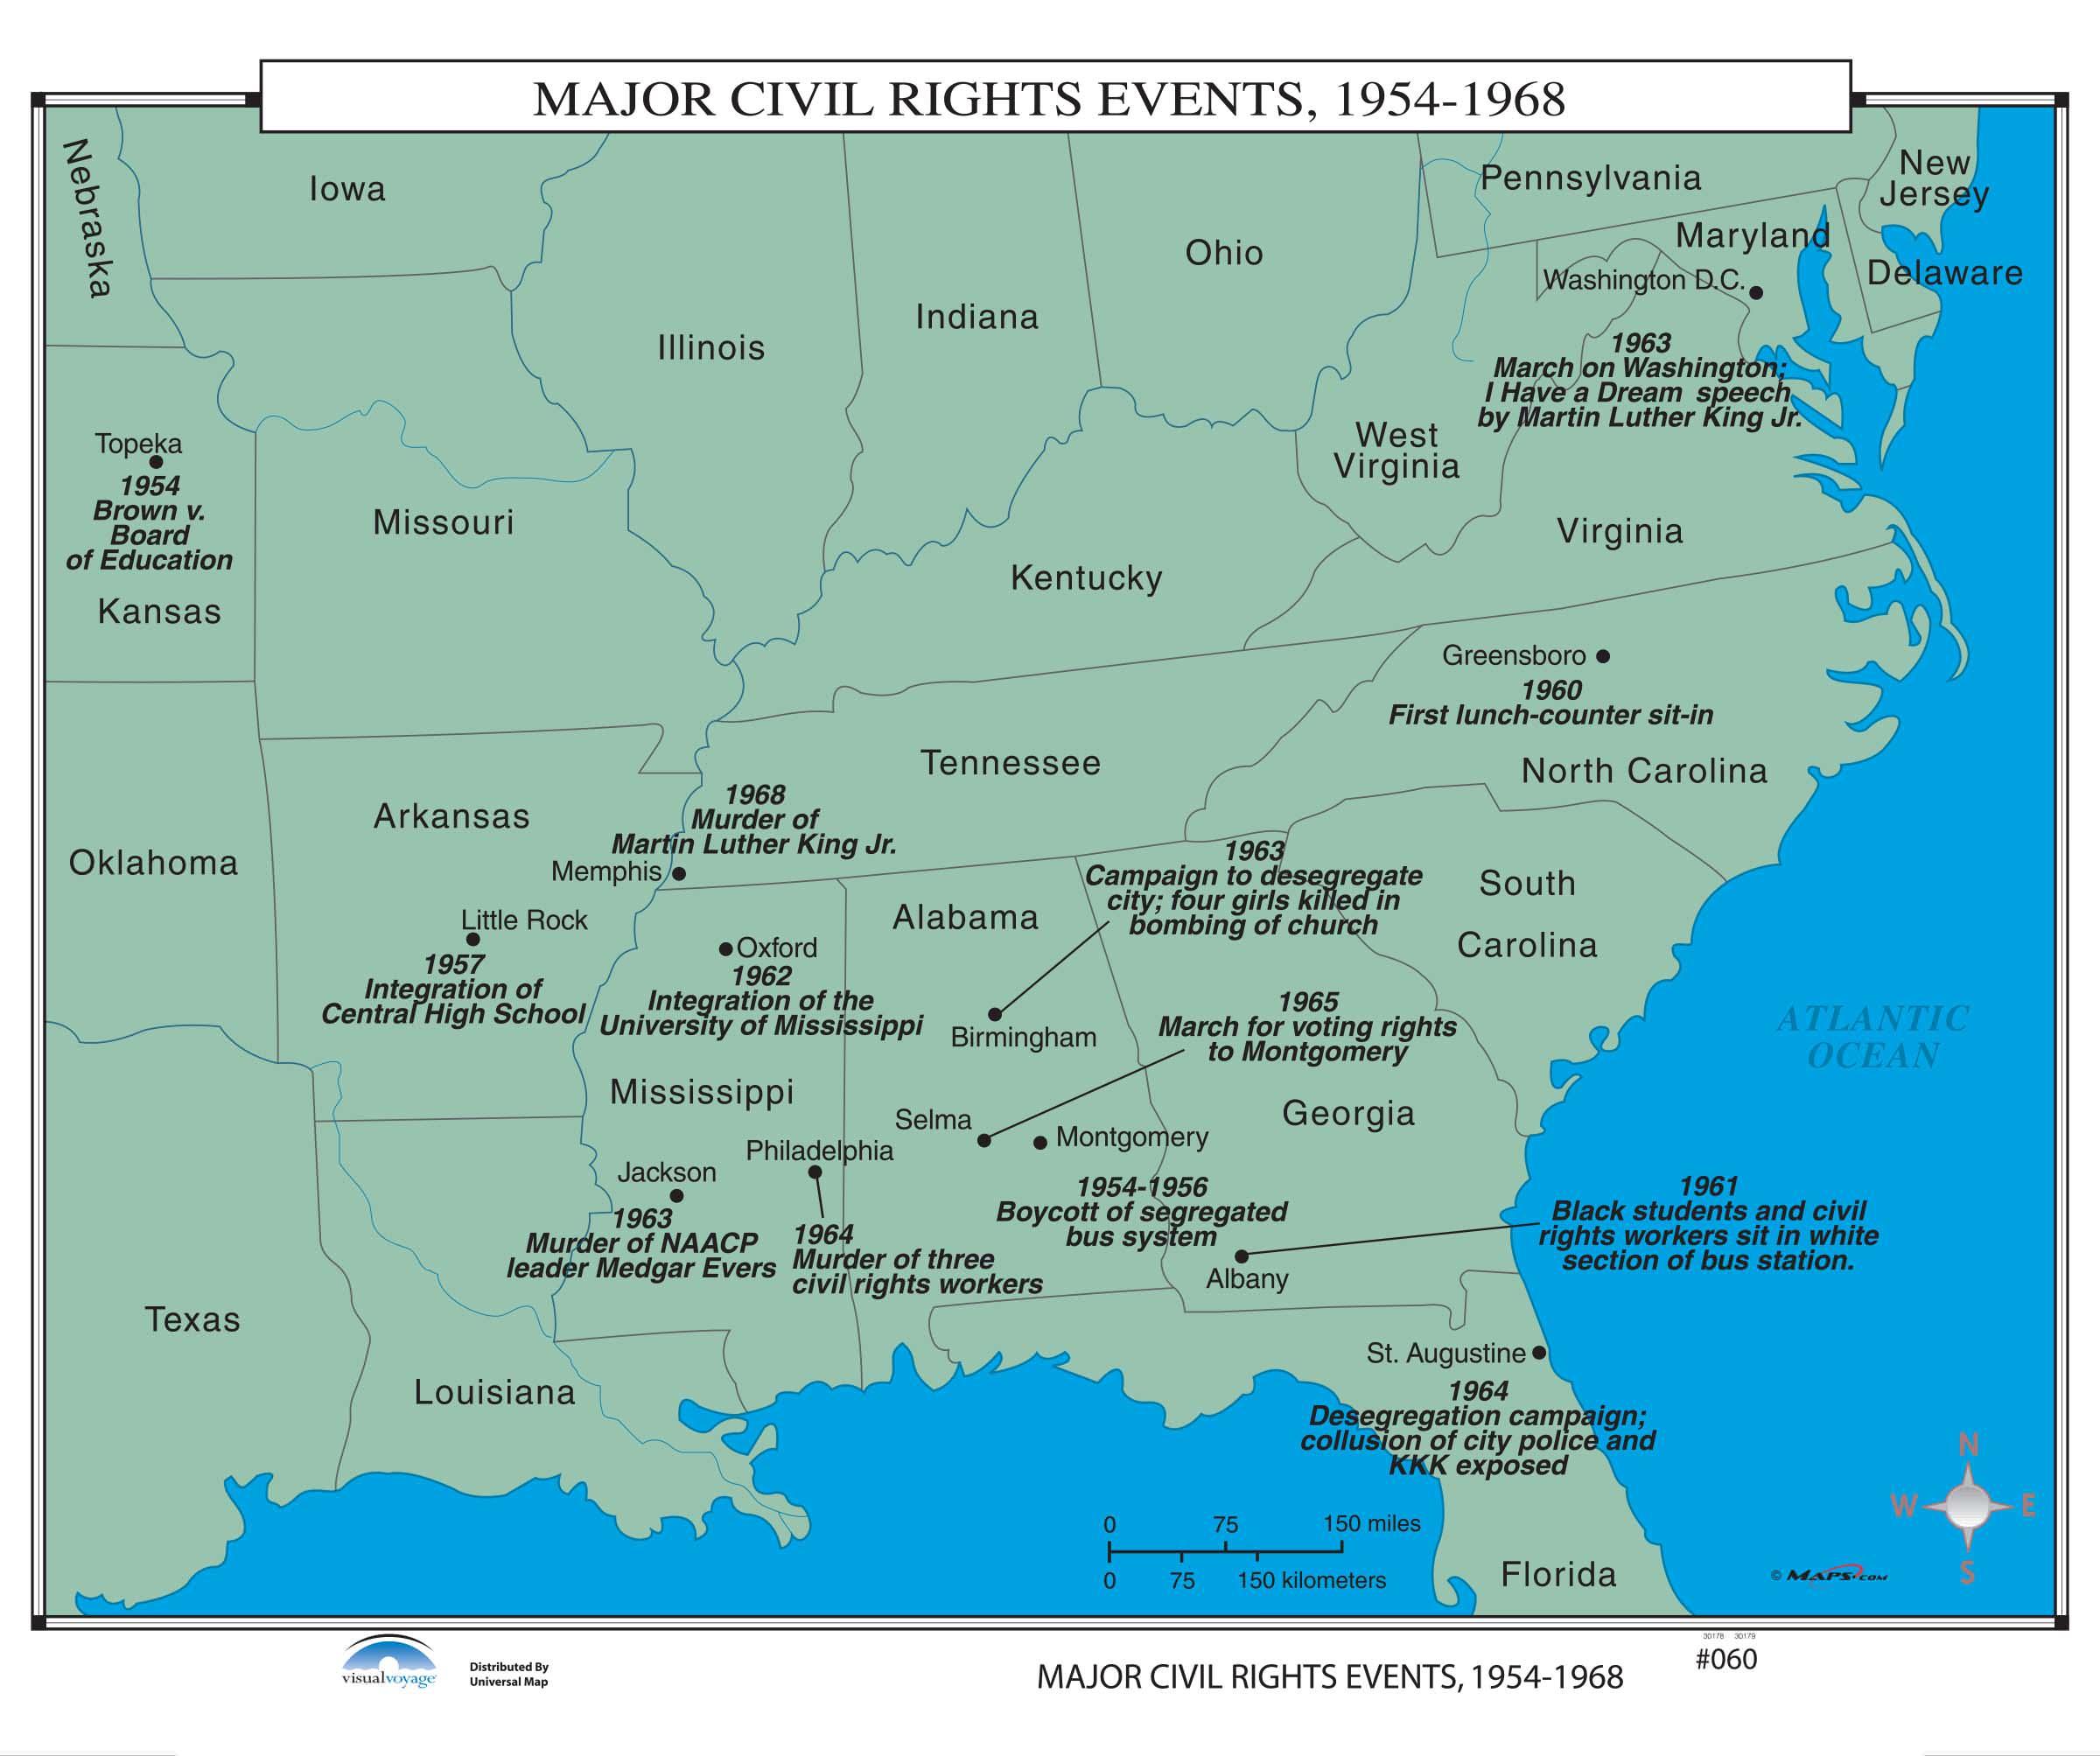 060 Major Civil Rights Events Kappa Map Group